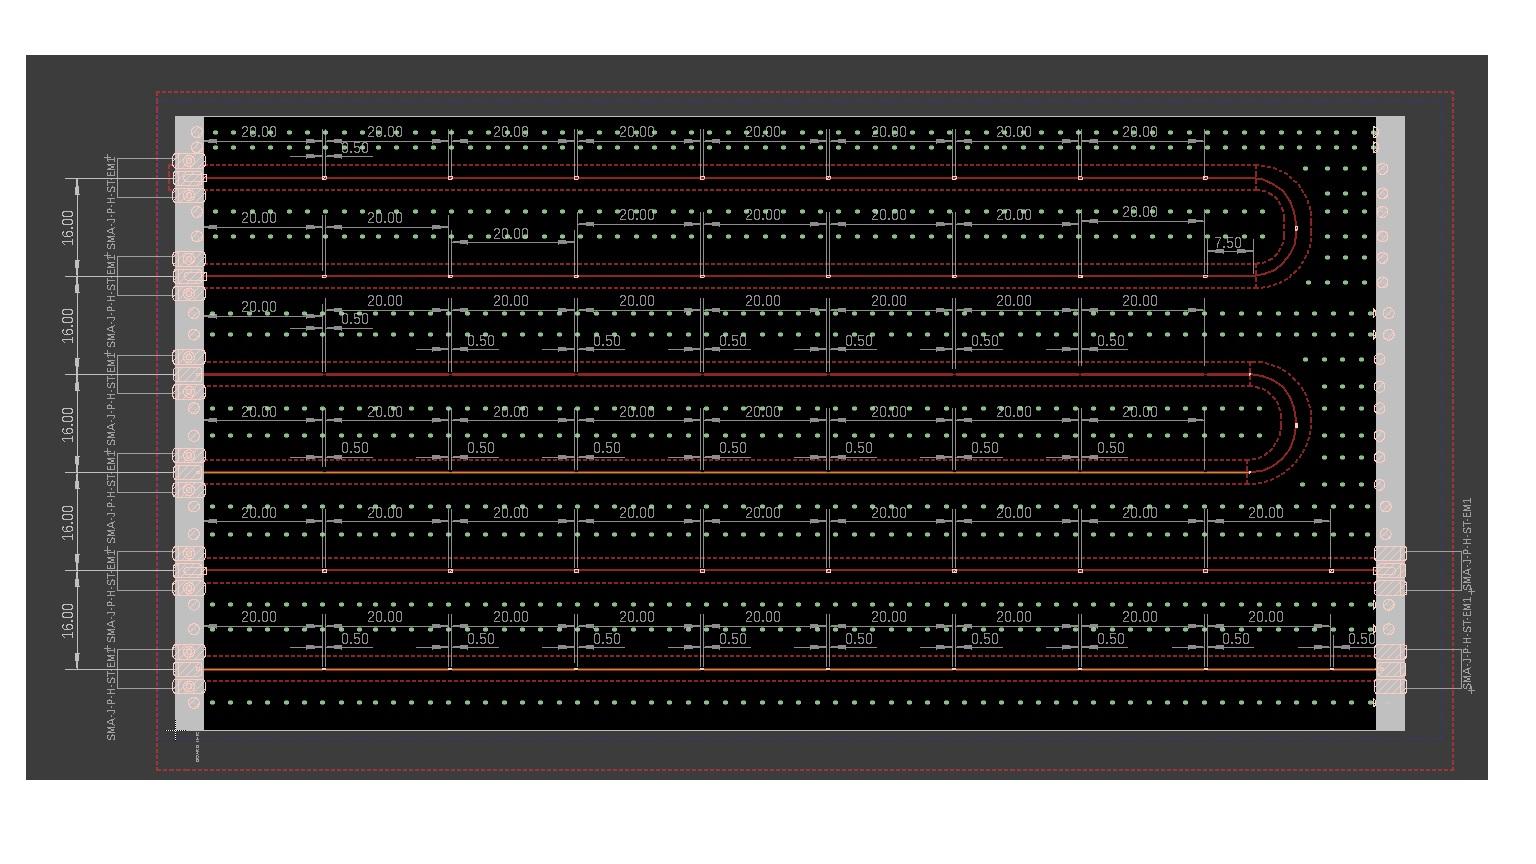 How can I draw a Flex-rigid board or a flexible PCB with